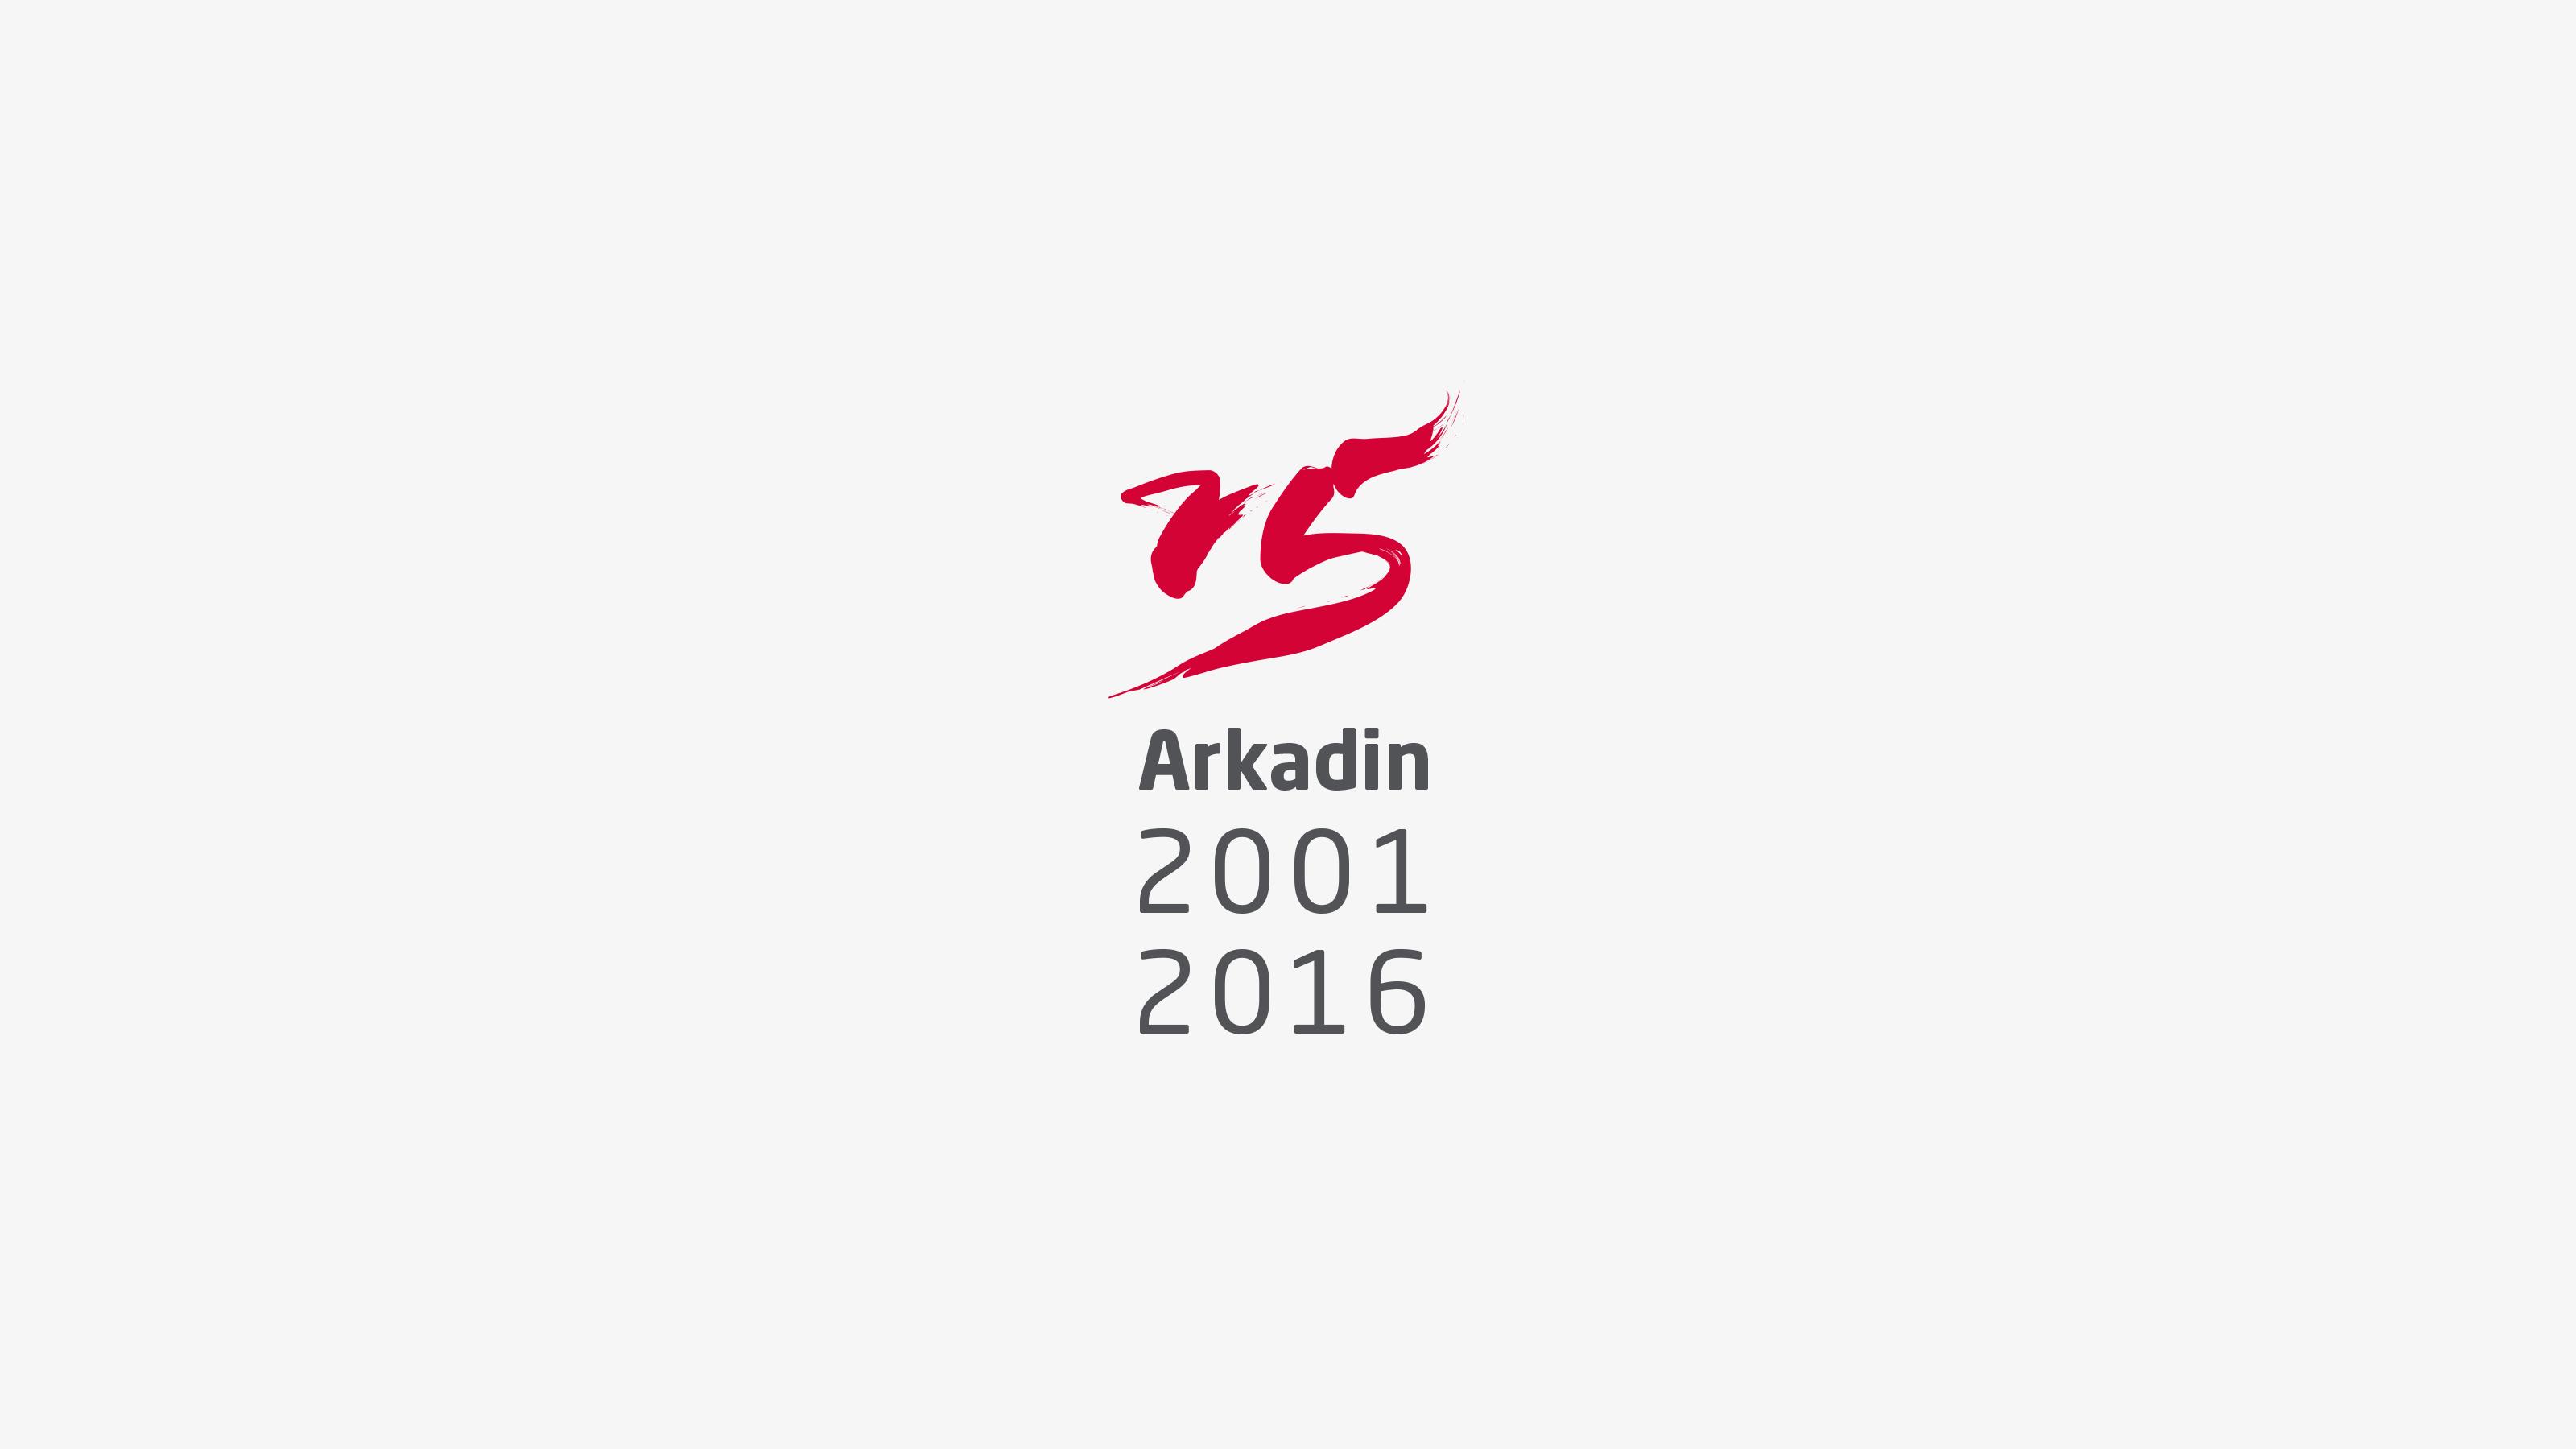 Marketing 15 years logo Arkadin